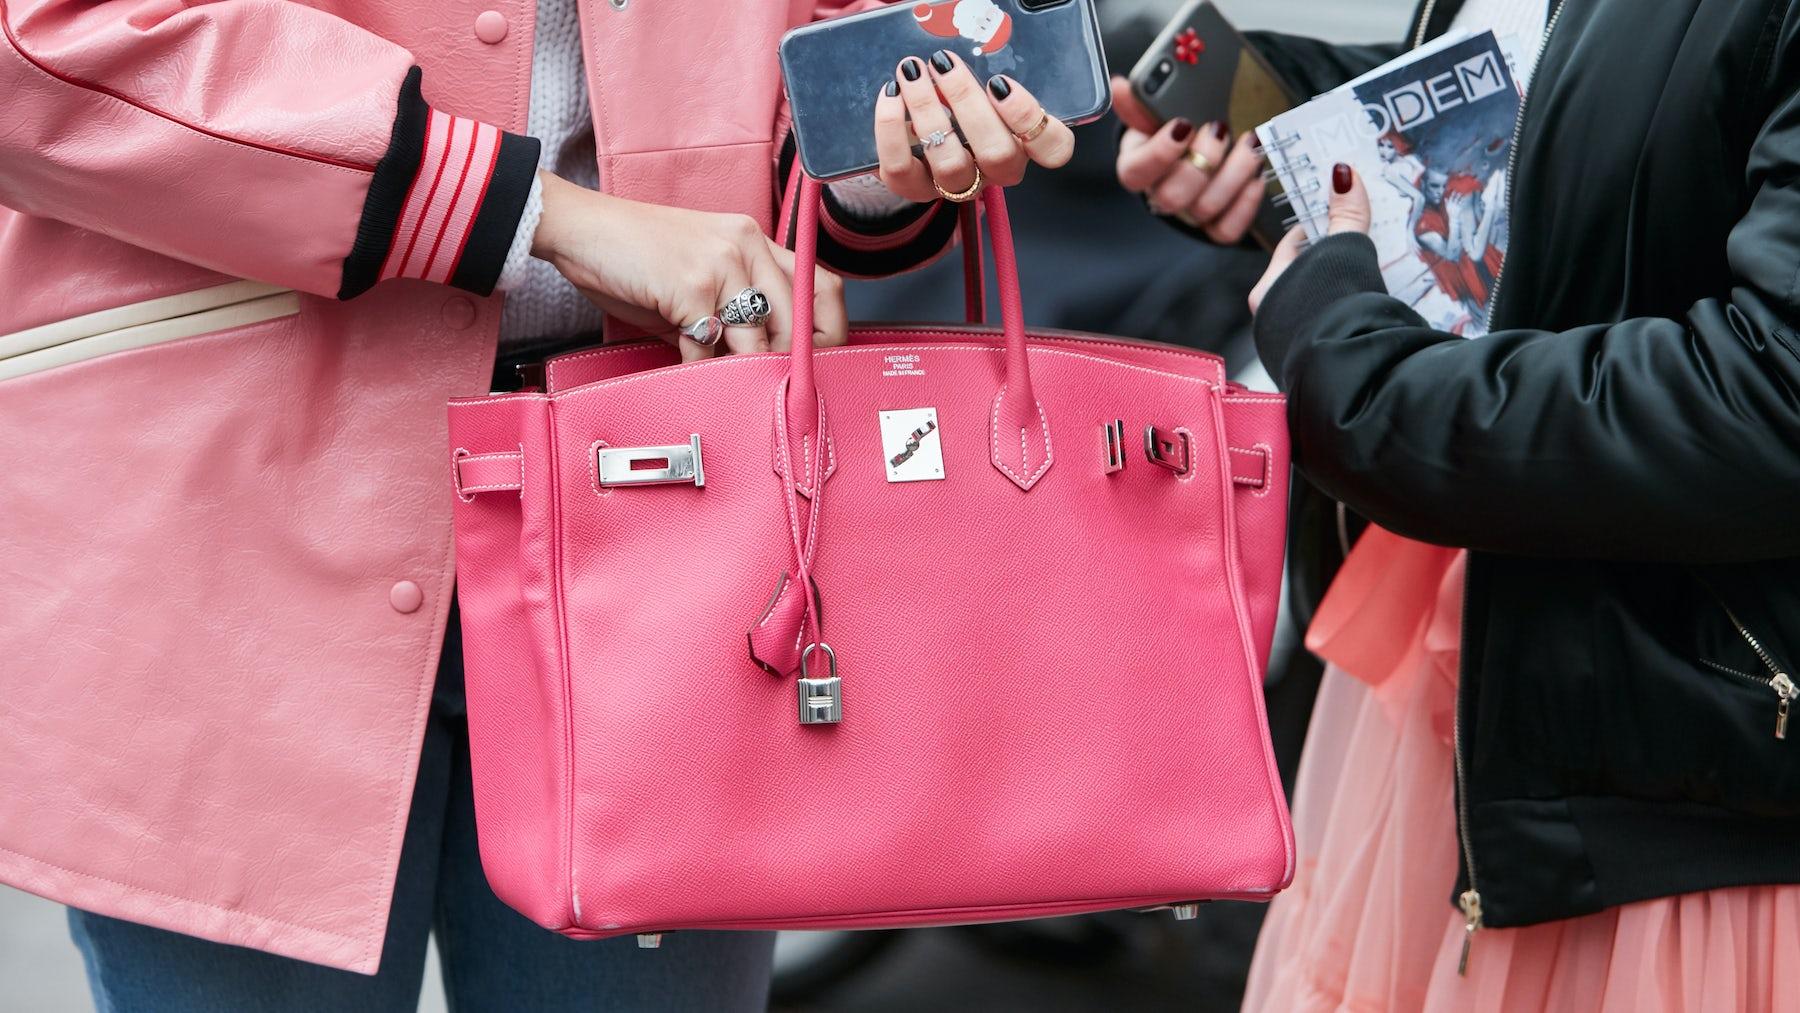 Hermès Birkin bag | Source: Shutterstock